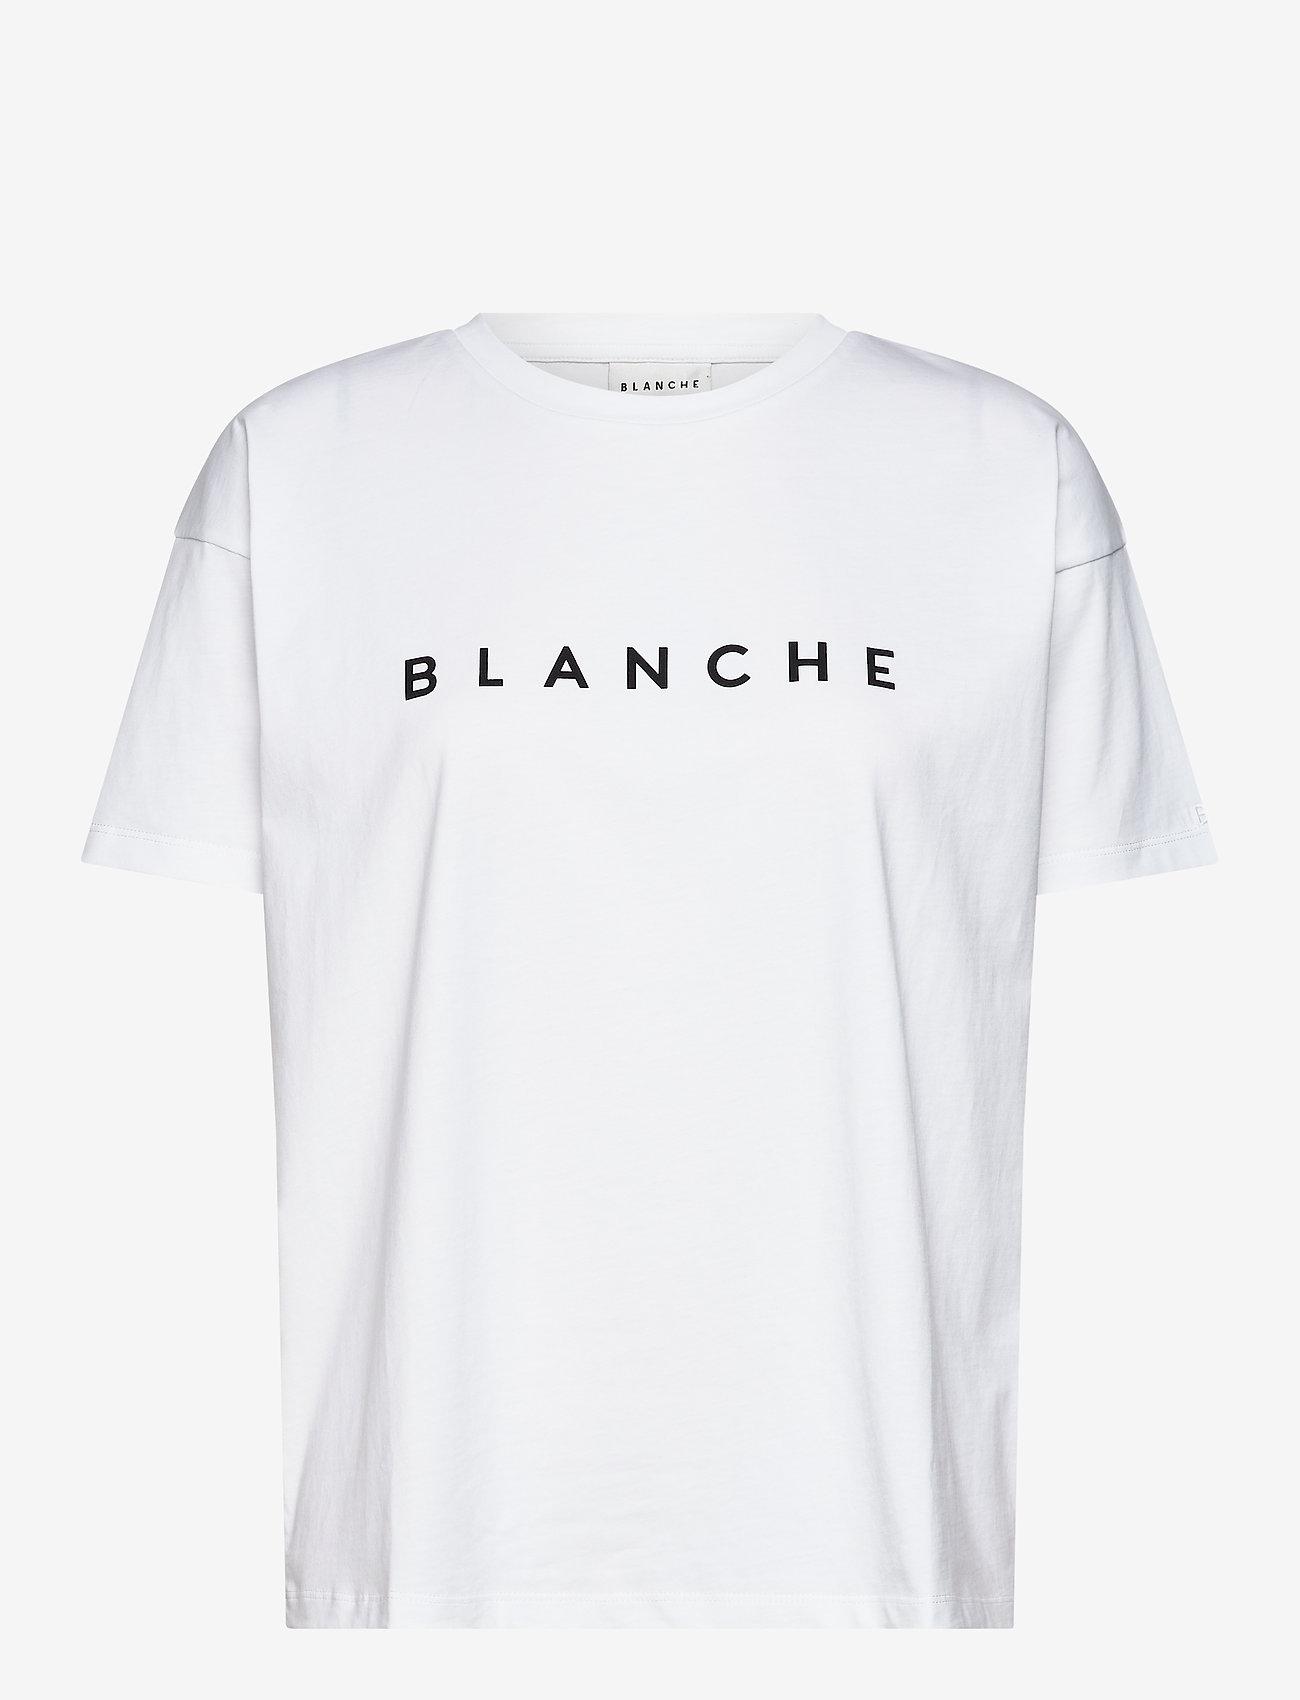 Blanche - Main - t-shirts - white - 0